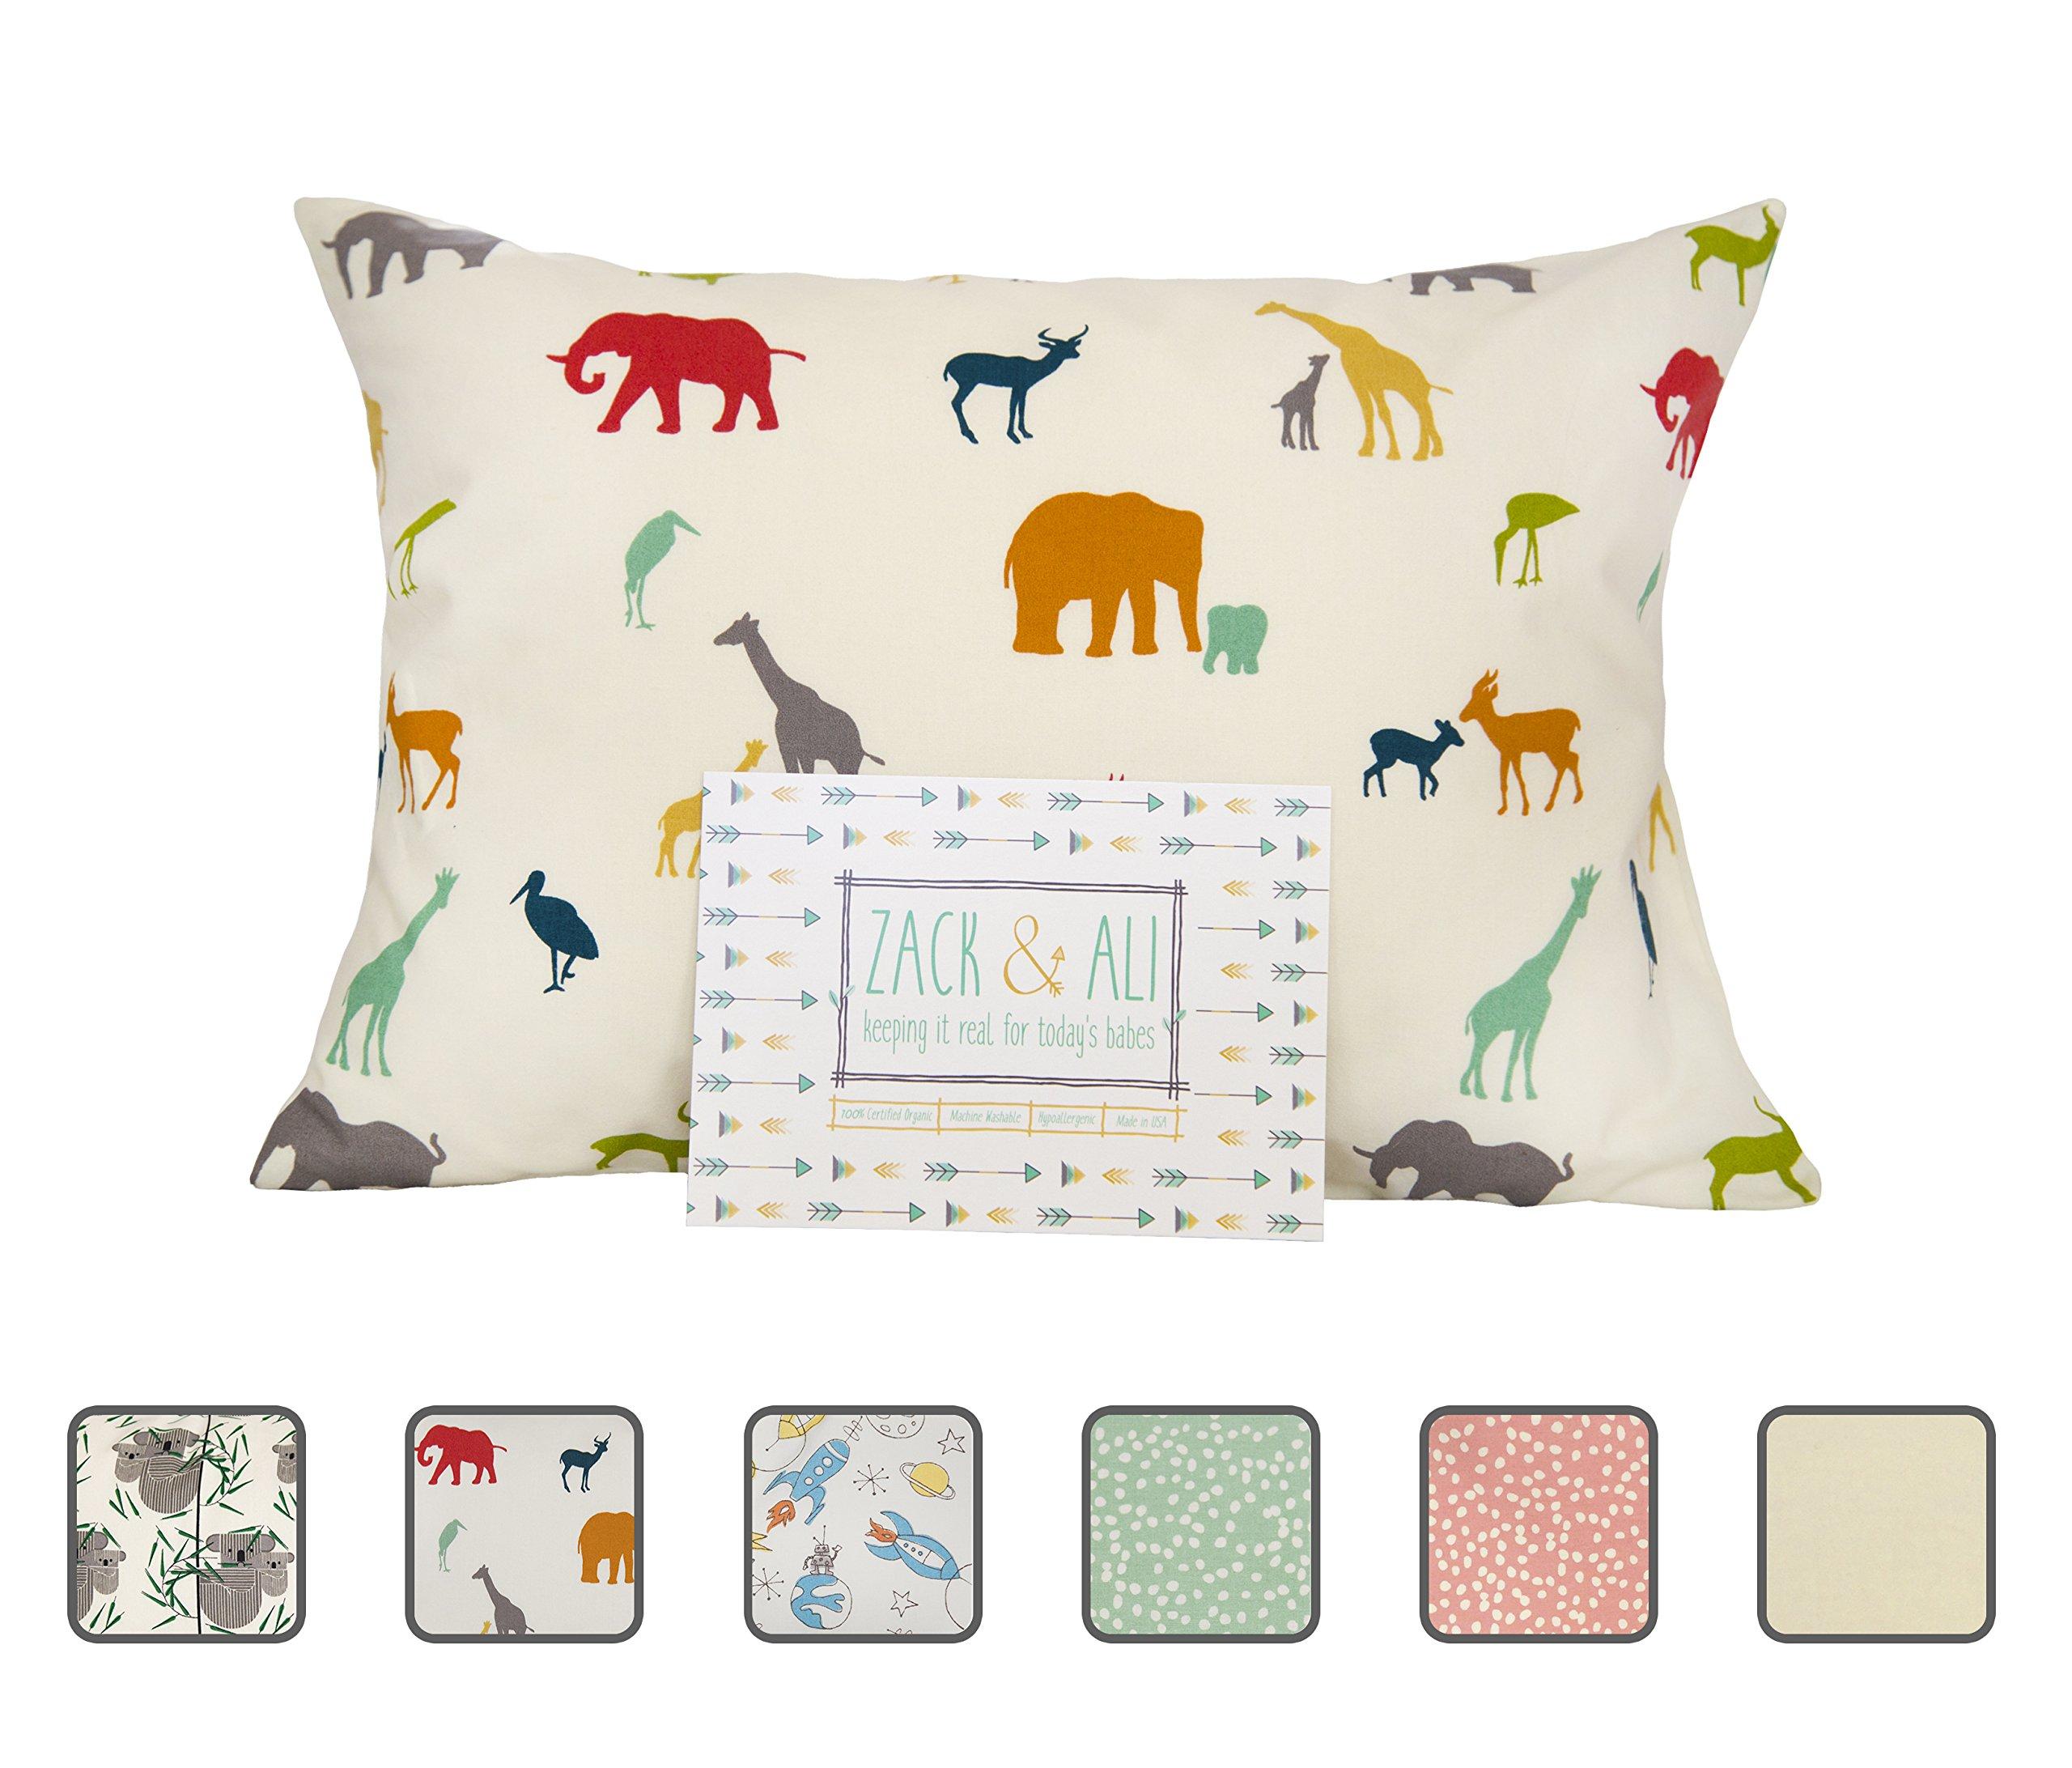 grande pillow myorganicsleep cotton products combo pillows wool best organic mattress topper sweetest